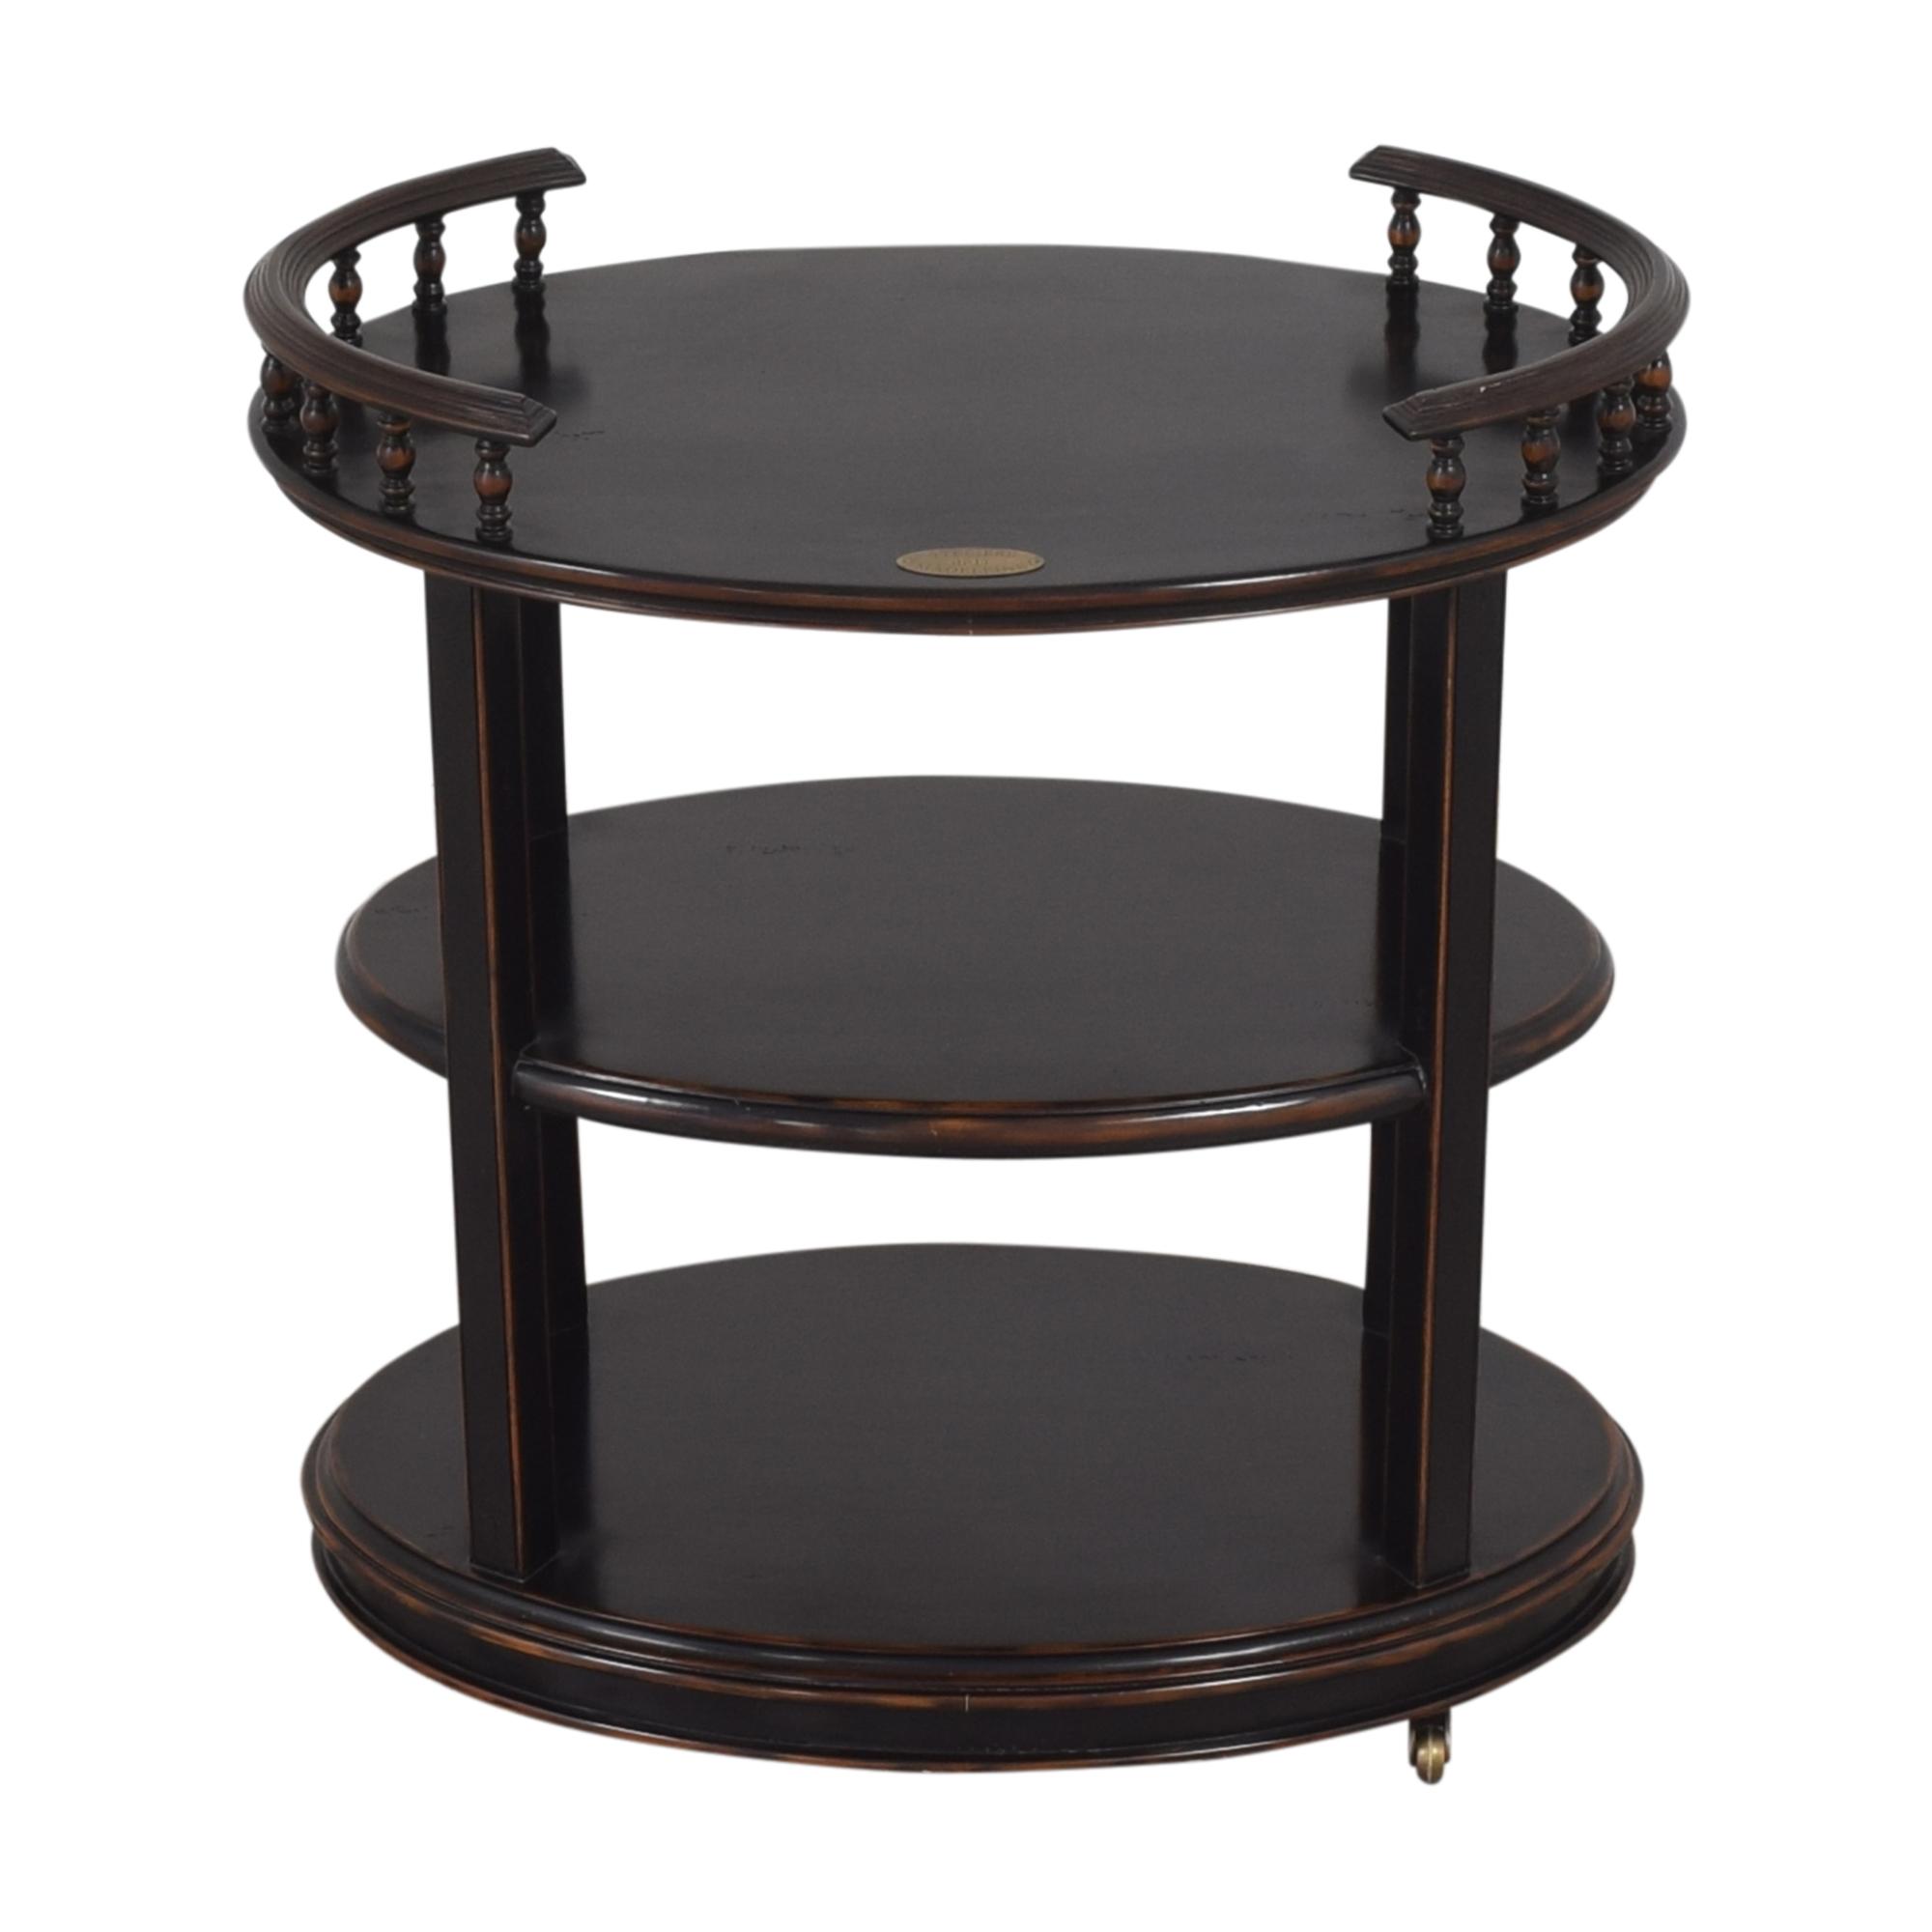 Theodore Alexander Ateliers De La Madeleine Side Table / Accent Tables